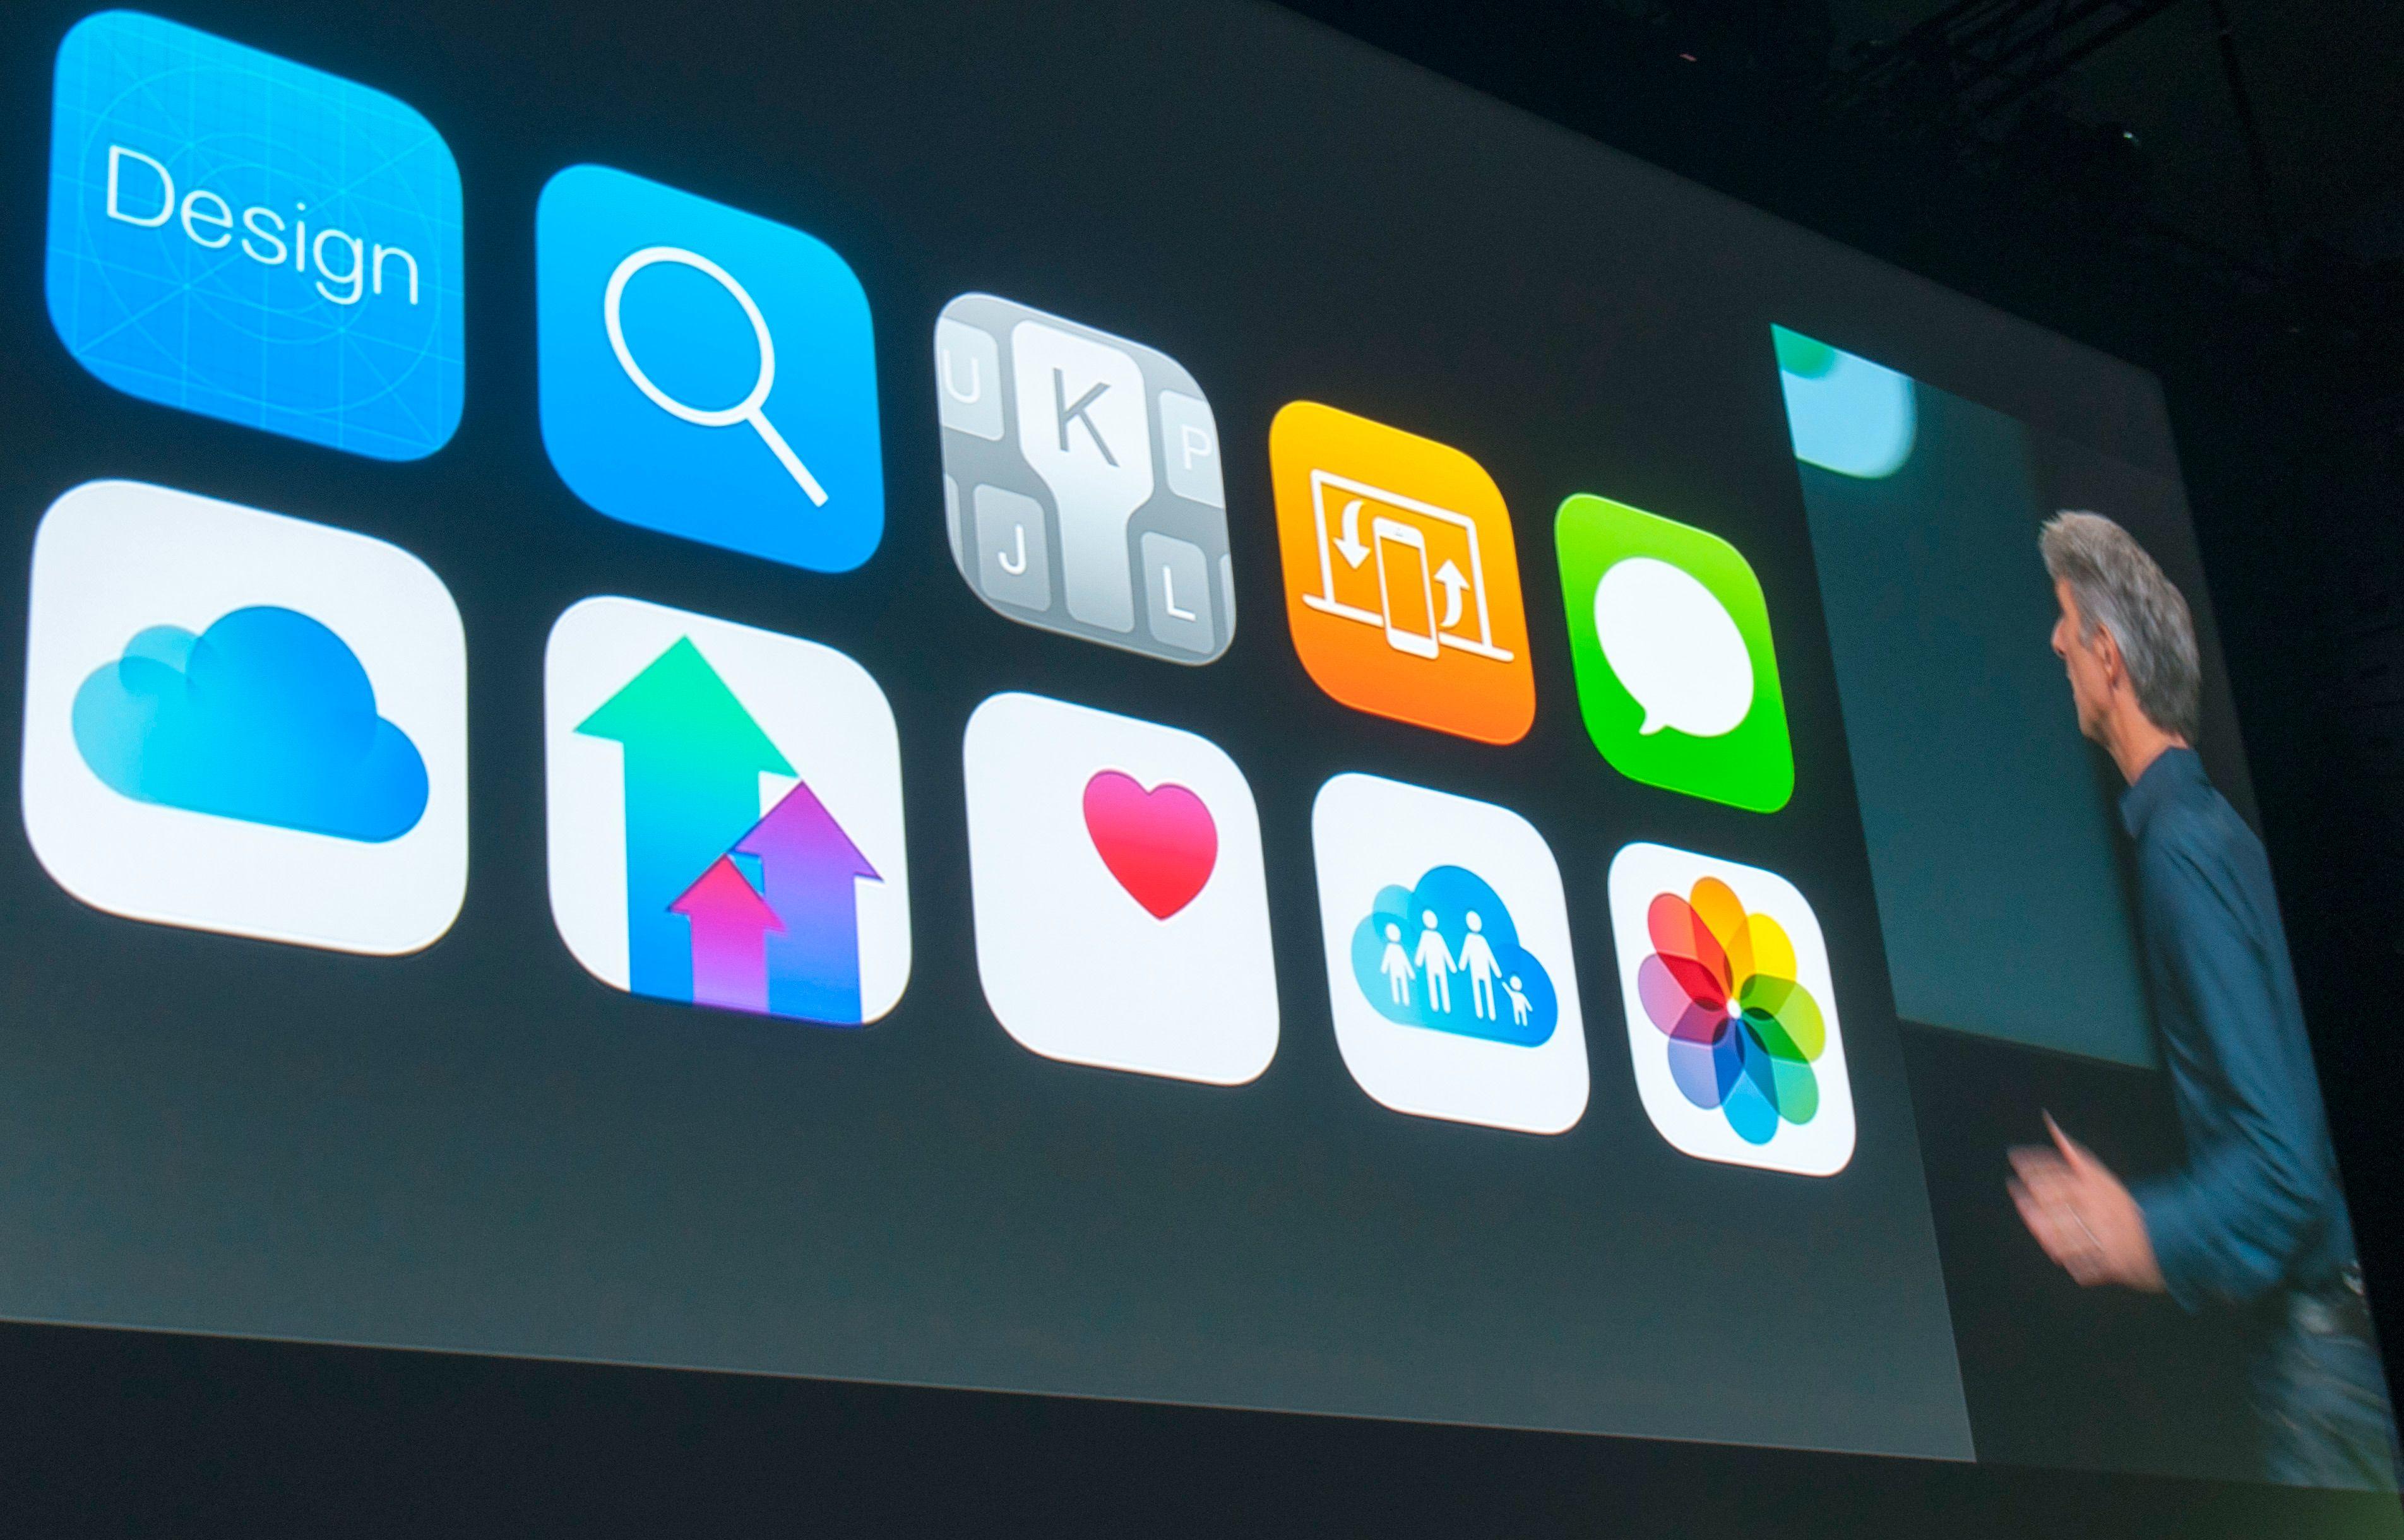 Federighi viser funksjoner i iOS 8.Foto: Finn Jarle Kvalheim, Tek.no